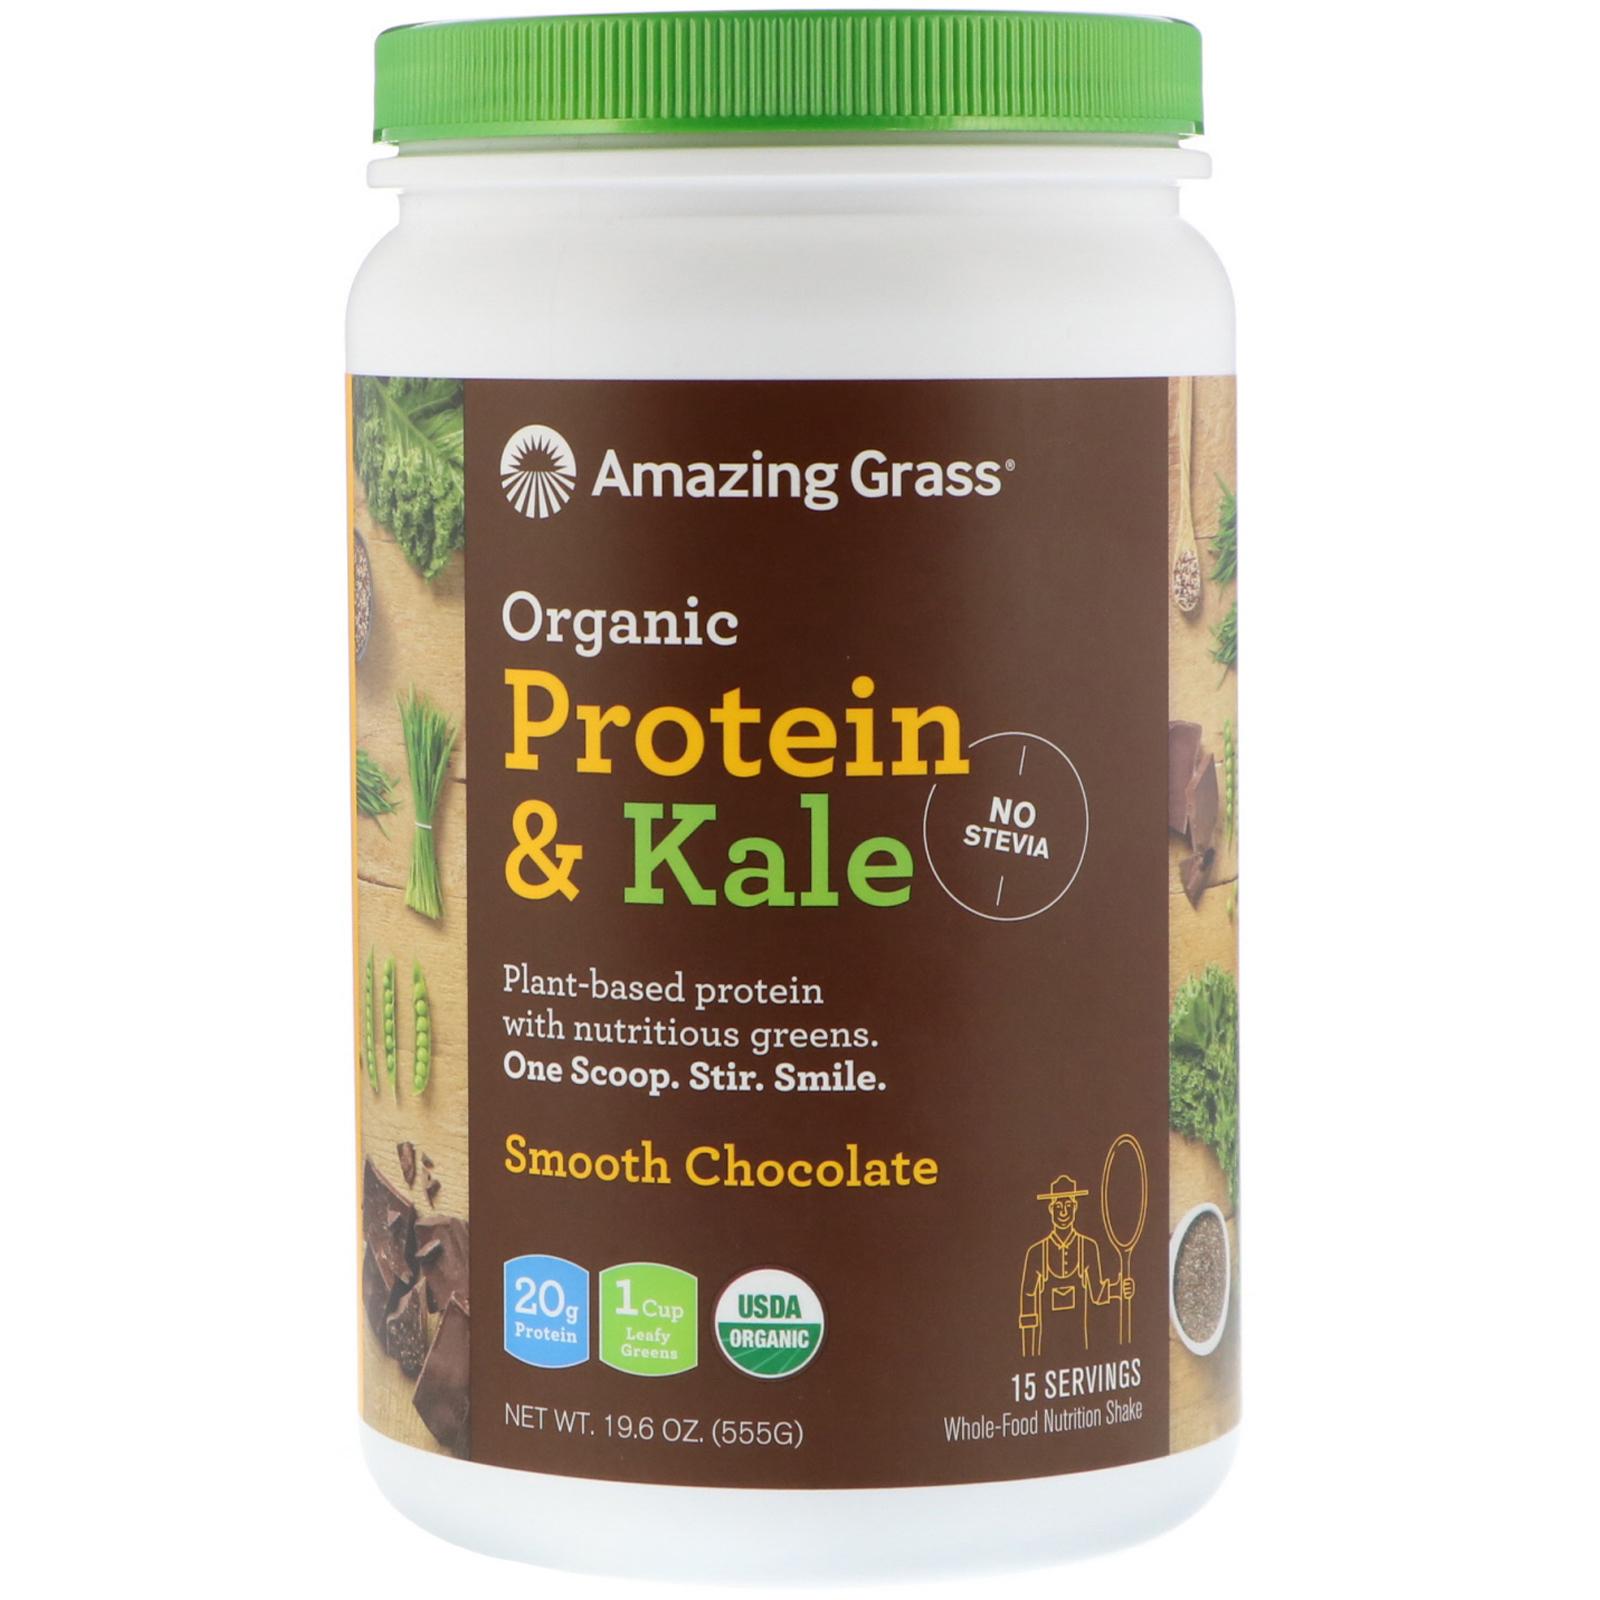 Amazing Grass, Organic Protein & Kale Powder, Plant Based, Smooth ...